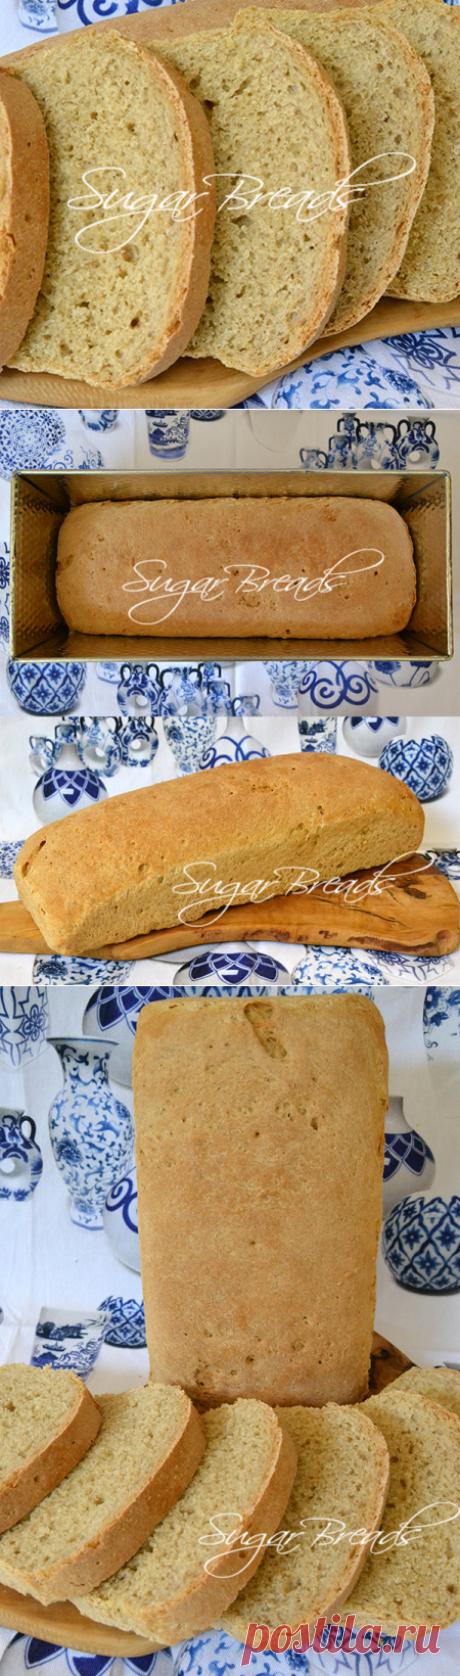 Деревенский хлеб из смешанной муки | Sugar & Breads in Russia